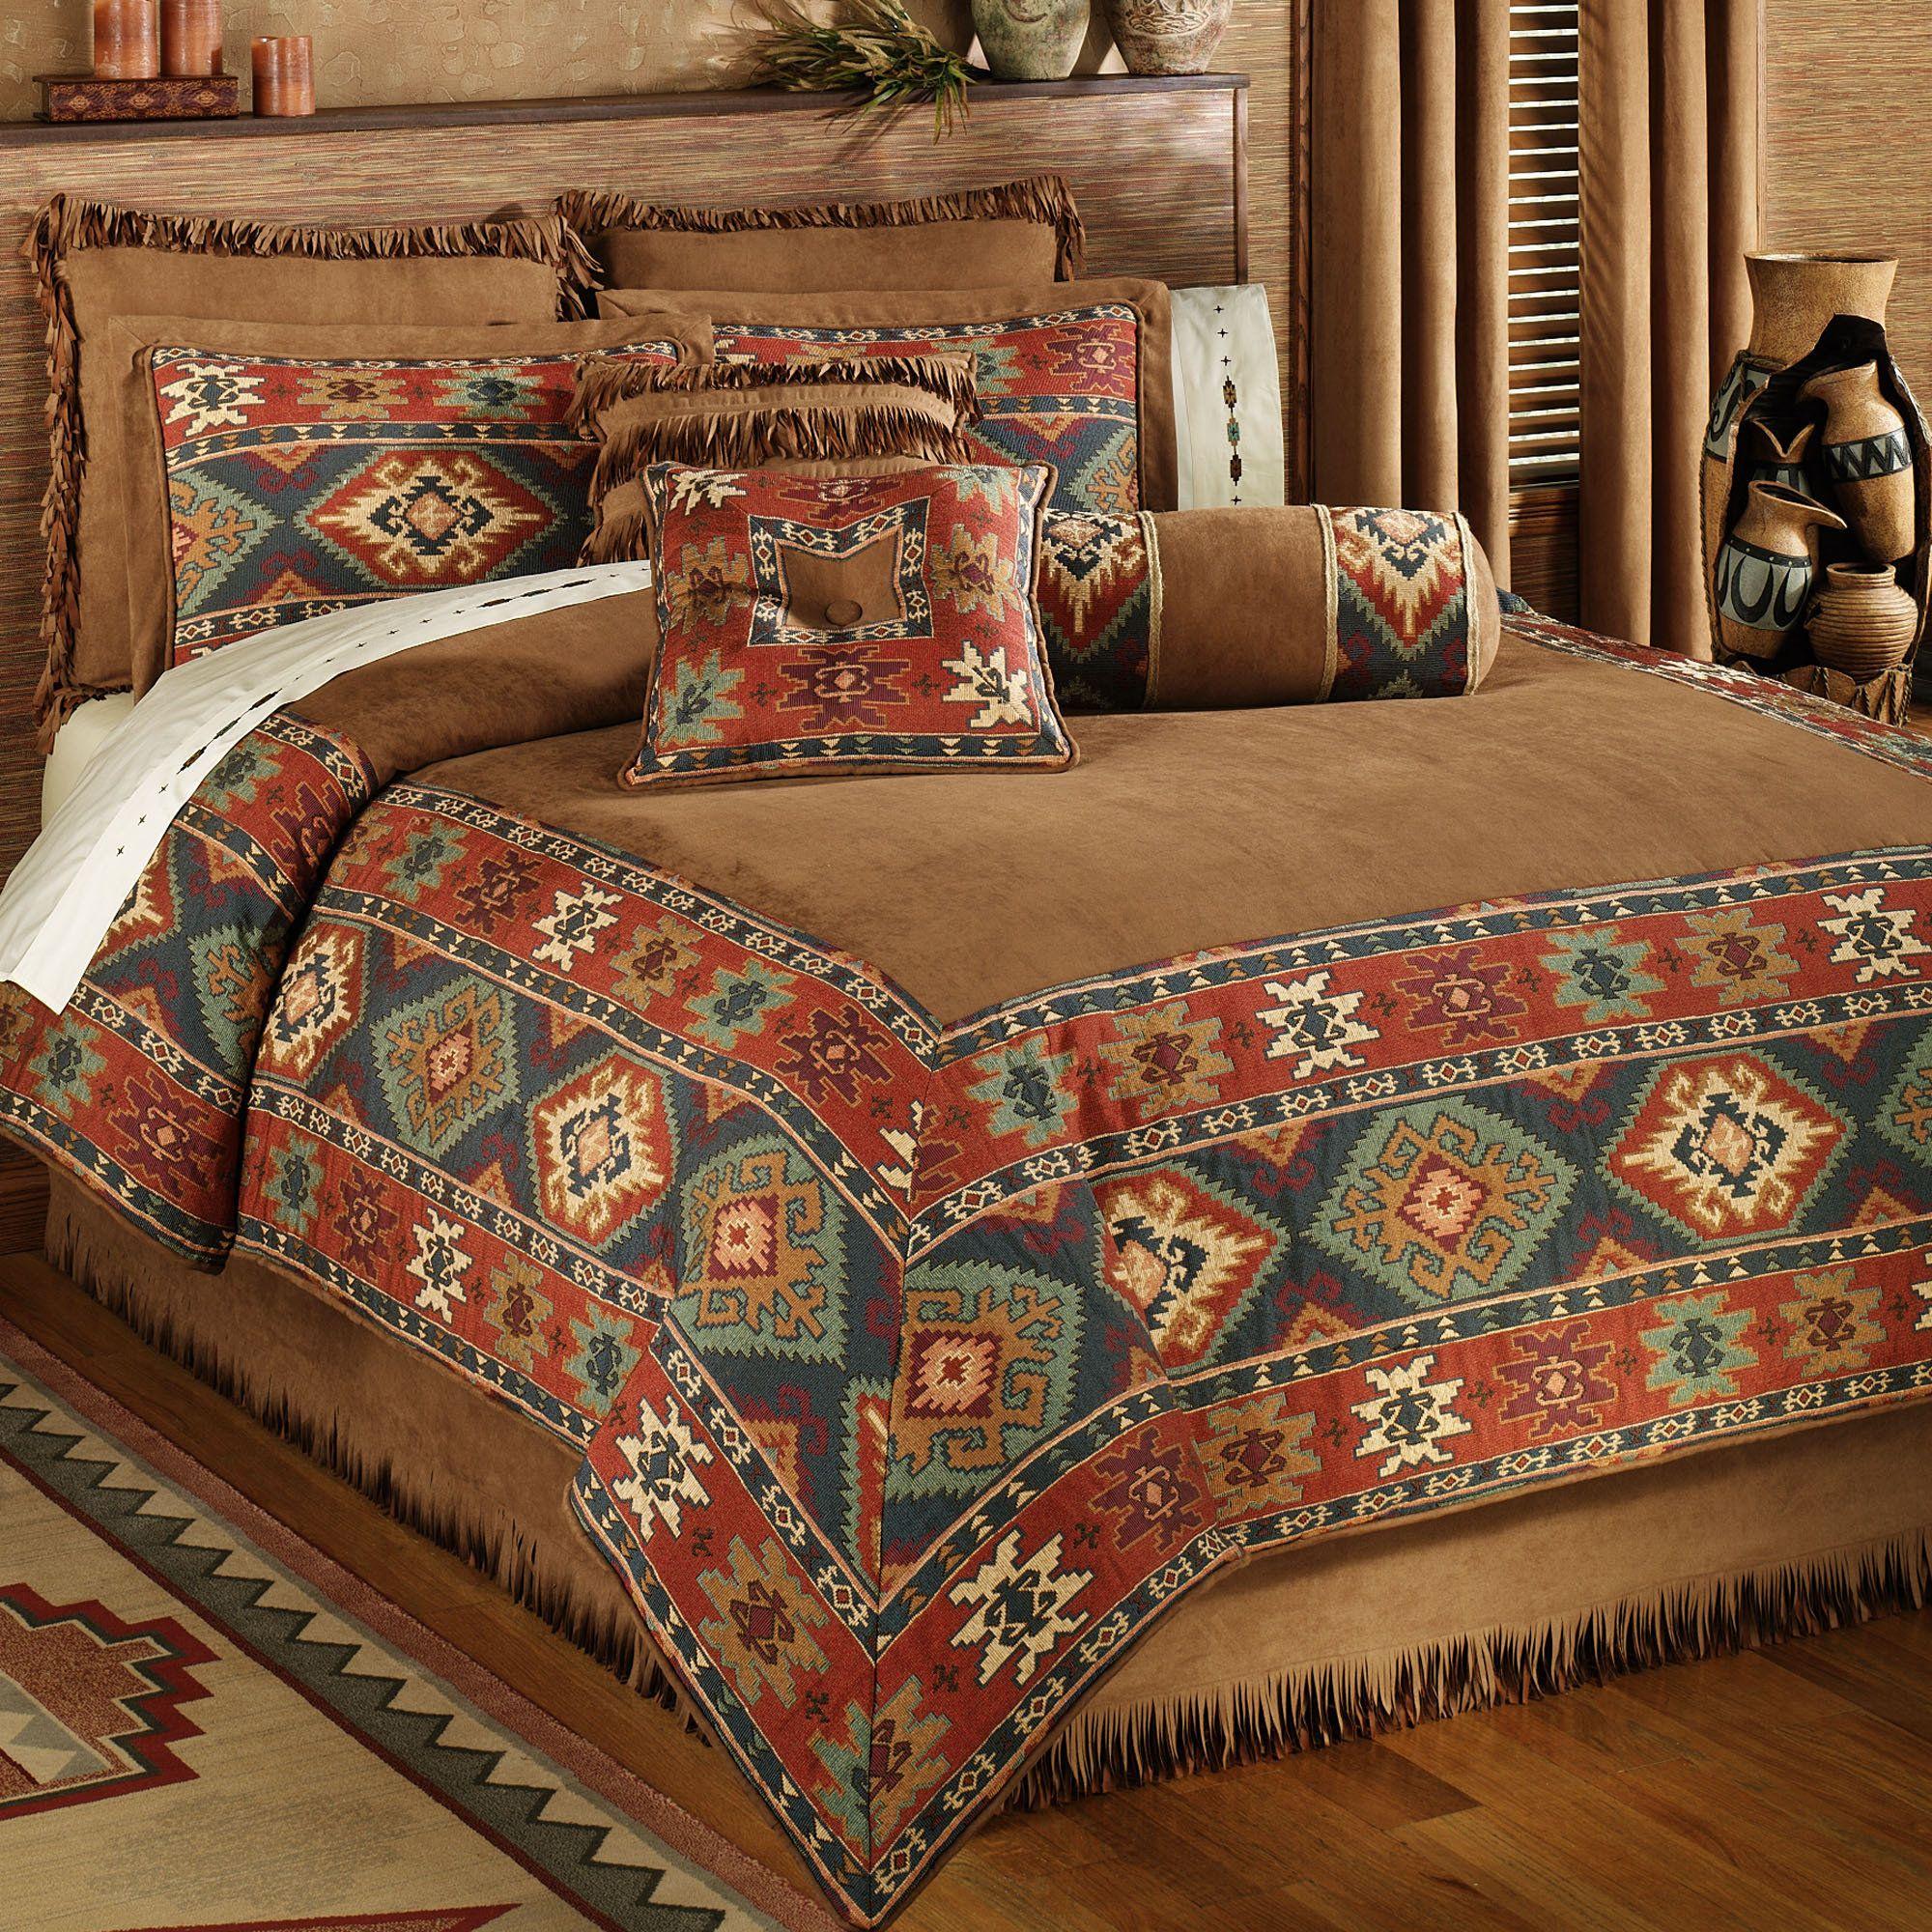 Native Bedroom Bedding Ideas Rustic